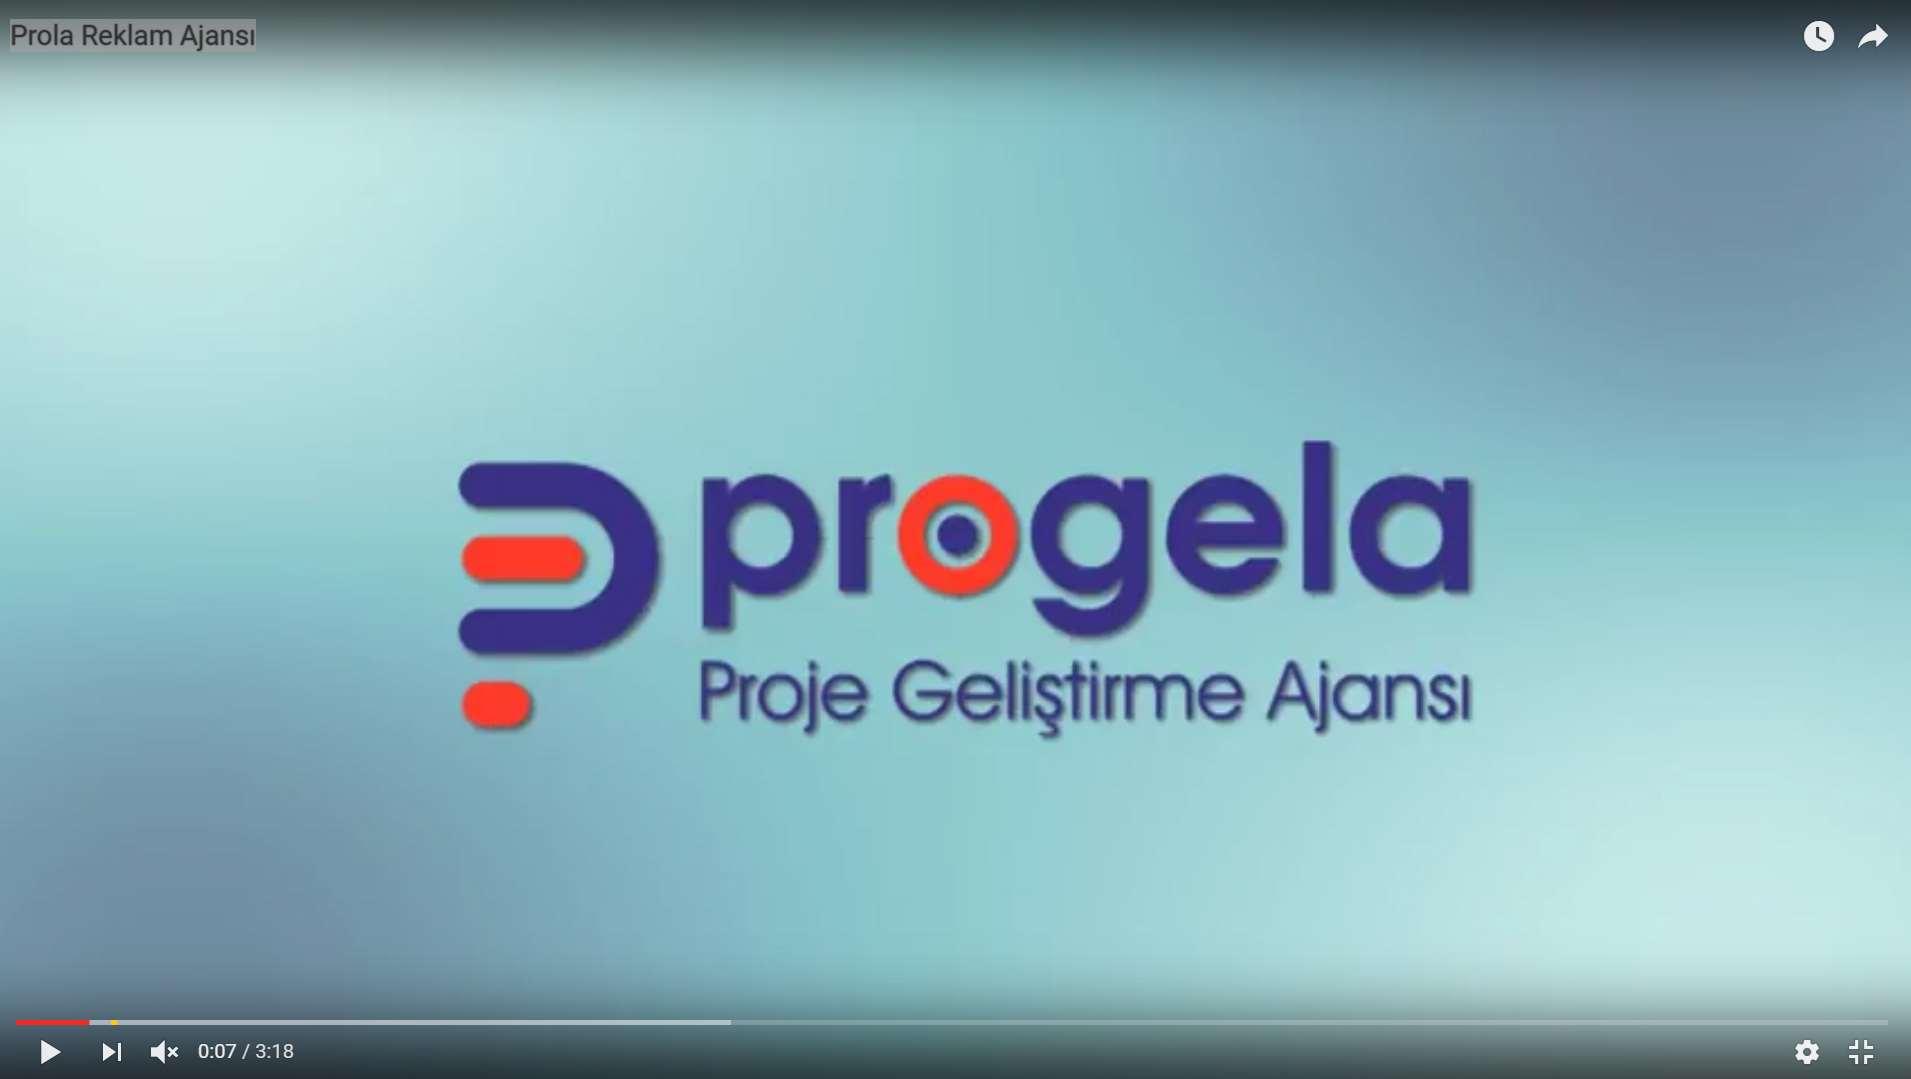 Progela Reklam Tanıtım Filmi